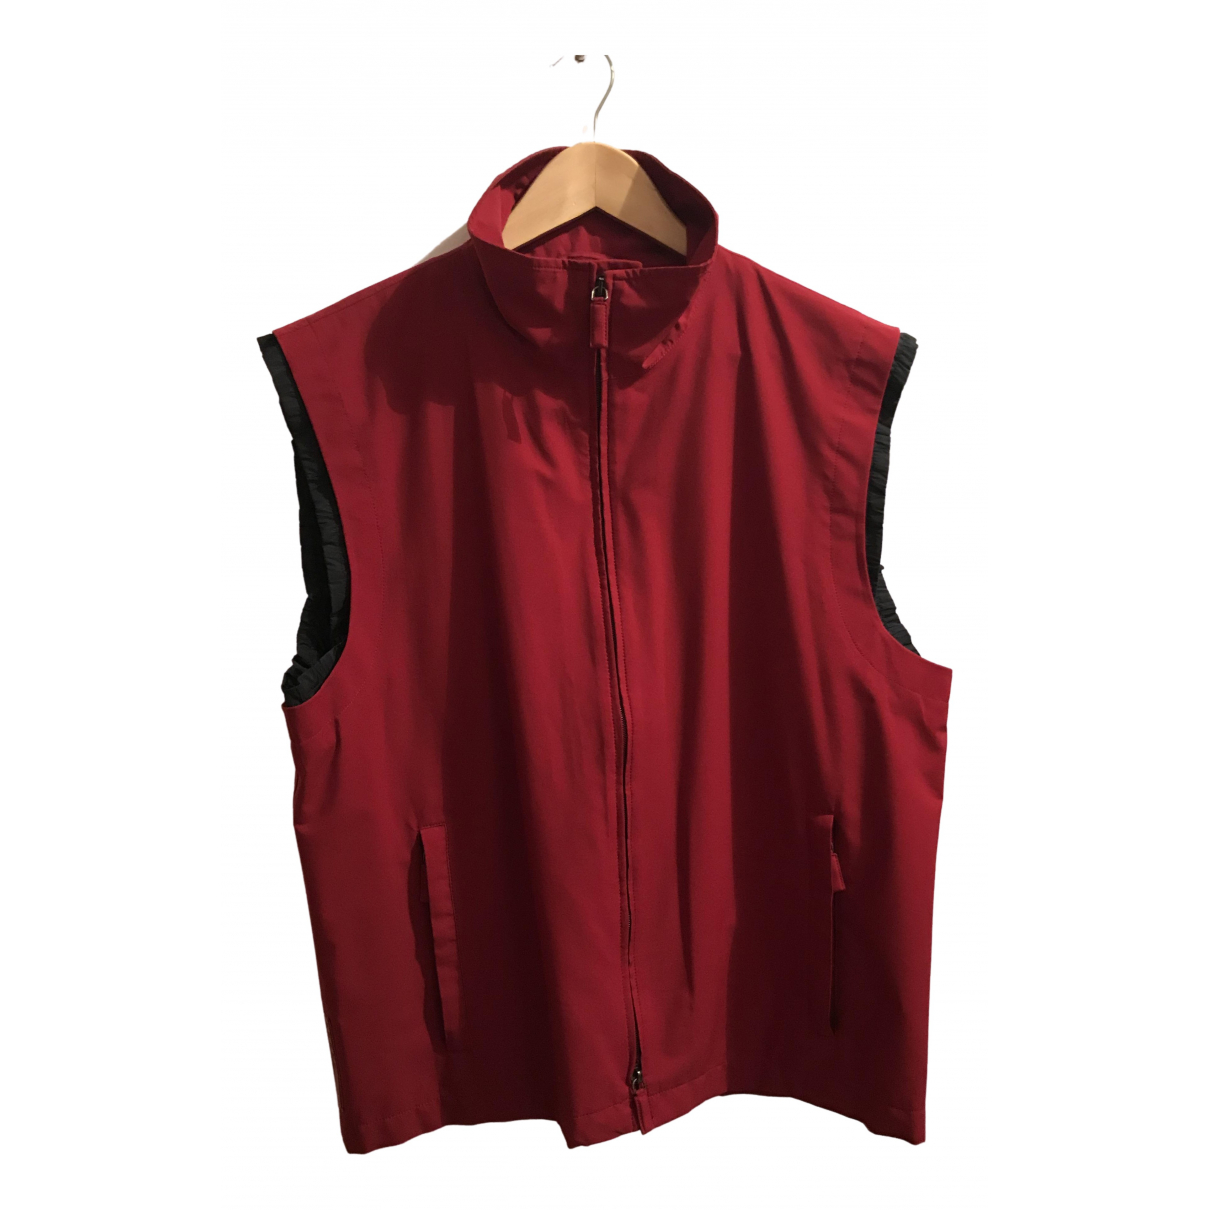 Prada \N Burgundy jacket for Women 54-56 IT